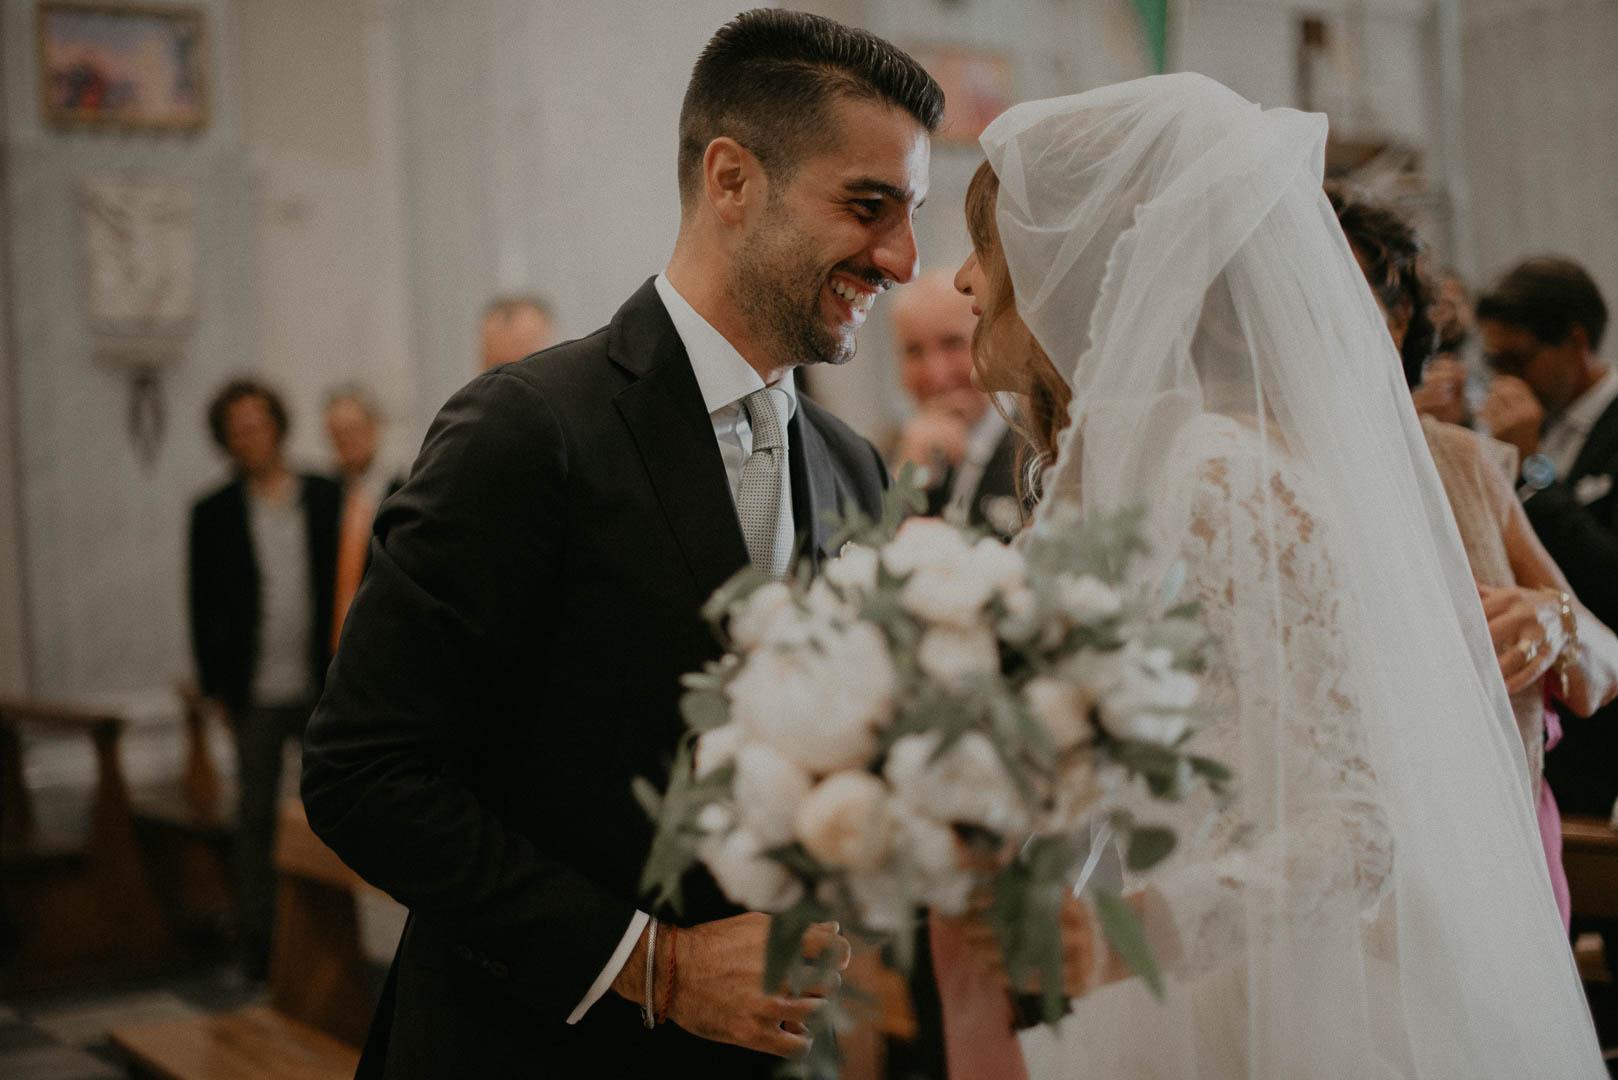 wedding-photographer-destination-fineart-bespoke-reportage-napoli-nabilah-vivianeizzo-spazio46-62